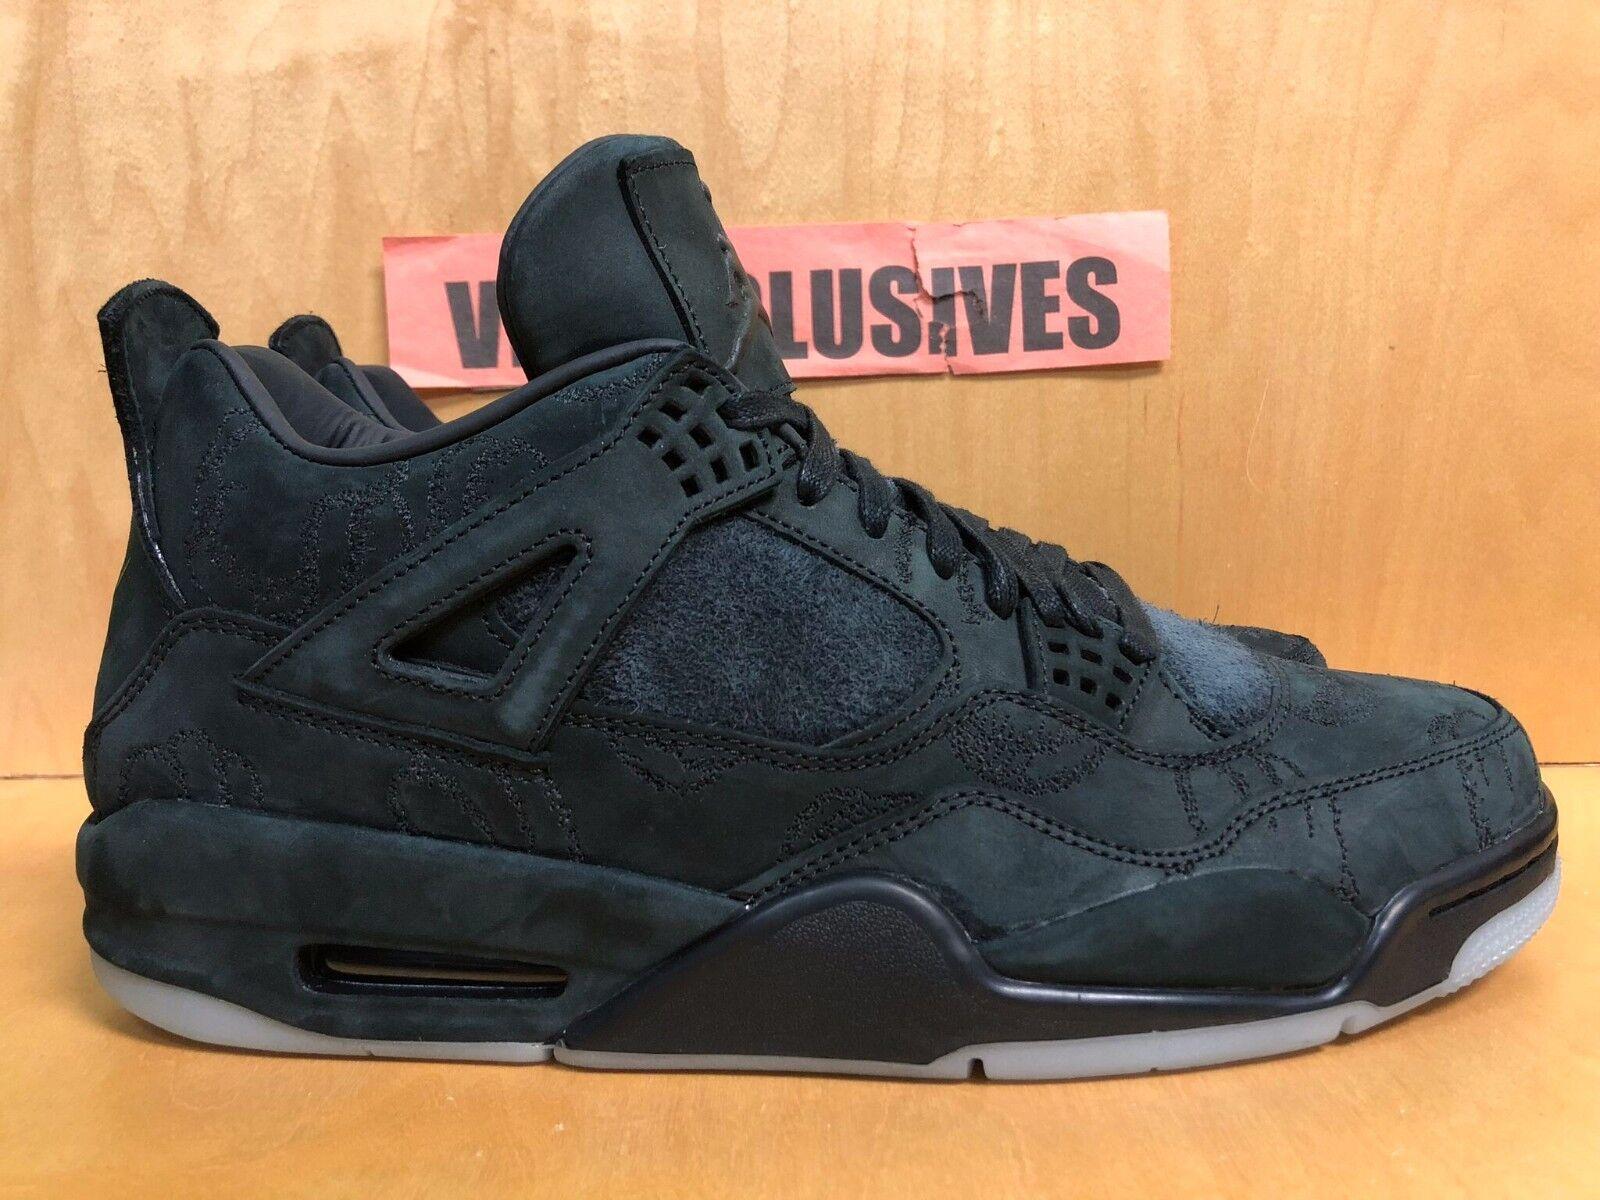 Nike Air Jordan IV Retro 4 x Kaws Black Clear Glow 930155-001 Size 11